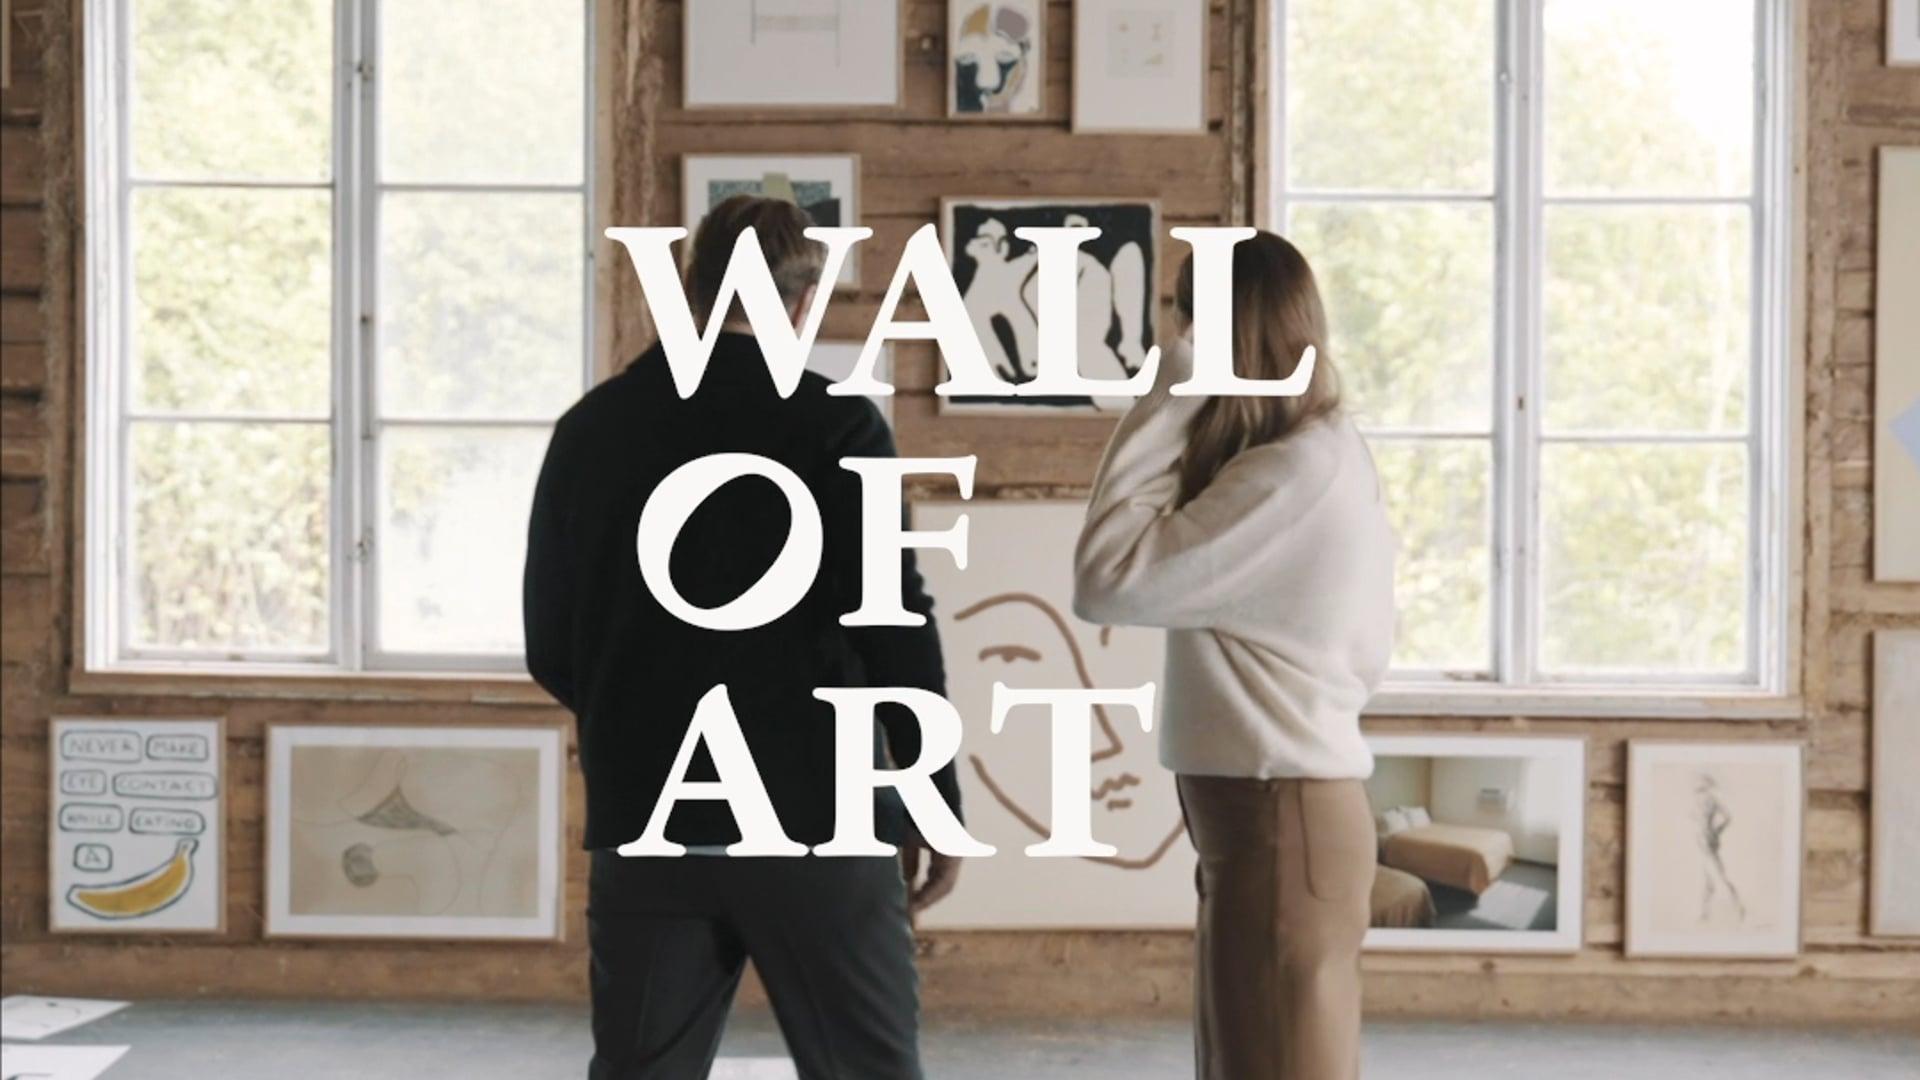 Wall of Art_SE_Master_4x3